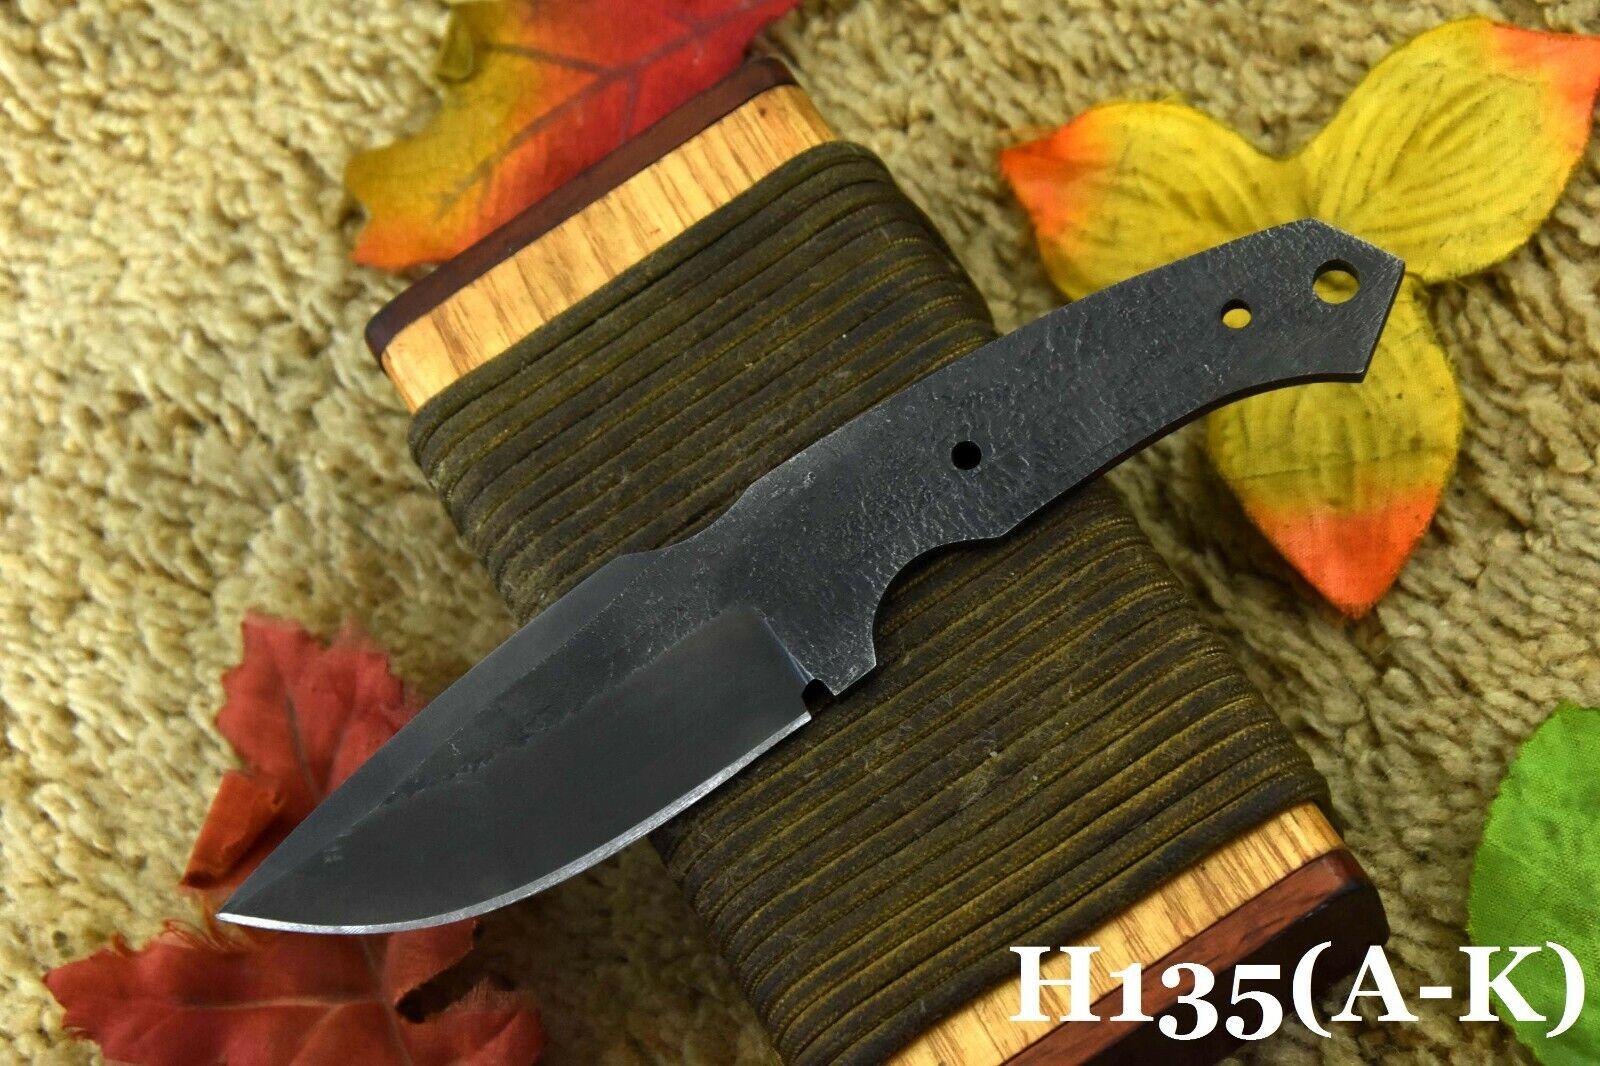 Knife Making Supply Spring Steel 5160 Blank Blade Hunting Knife Handmade D  - $6.99